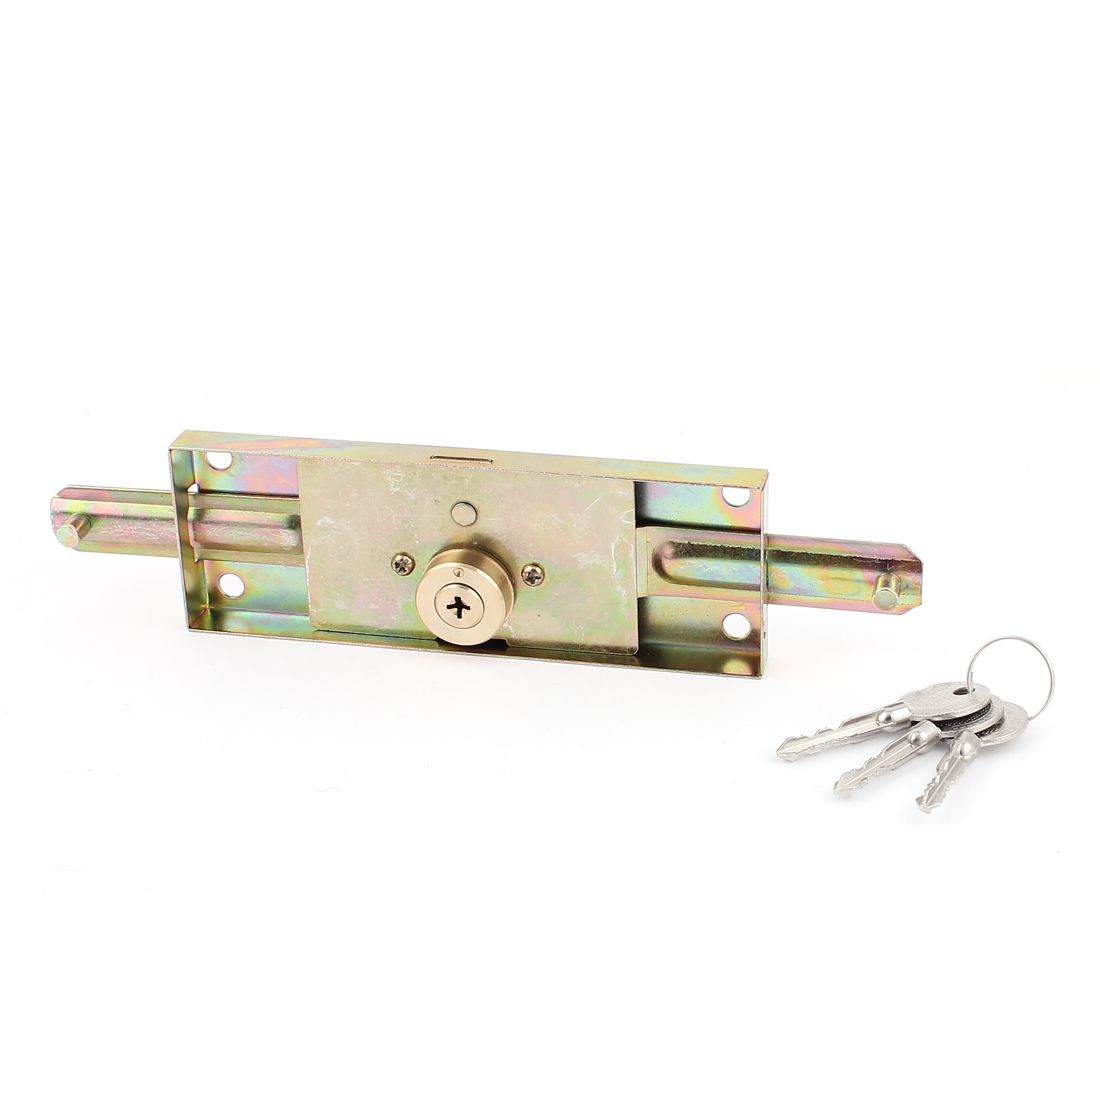 Brass Tone Metal Security Locking Locker Roller Rolling Gate Door Lock for Store Warehouse Garage